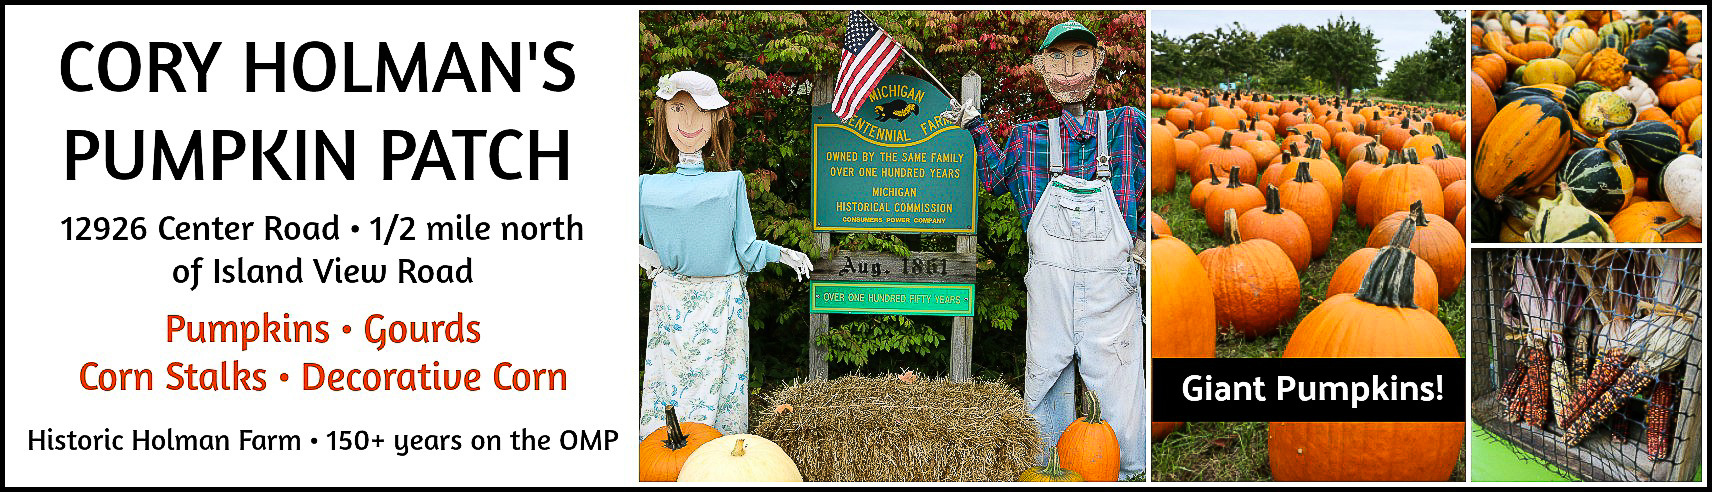 cory holman's pumpkin patch, old mission pumpkins, old mission peninsula, old mission farm stands, cory holman, holman farm, old mission gazette, old mission, old mission michigan, peninsula township